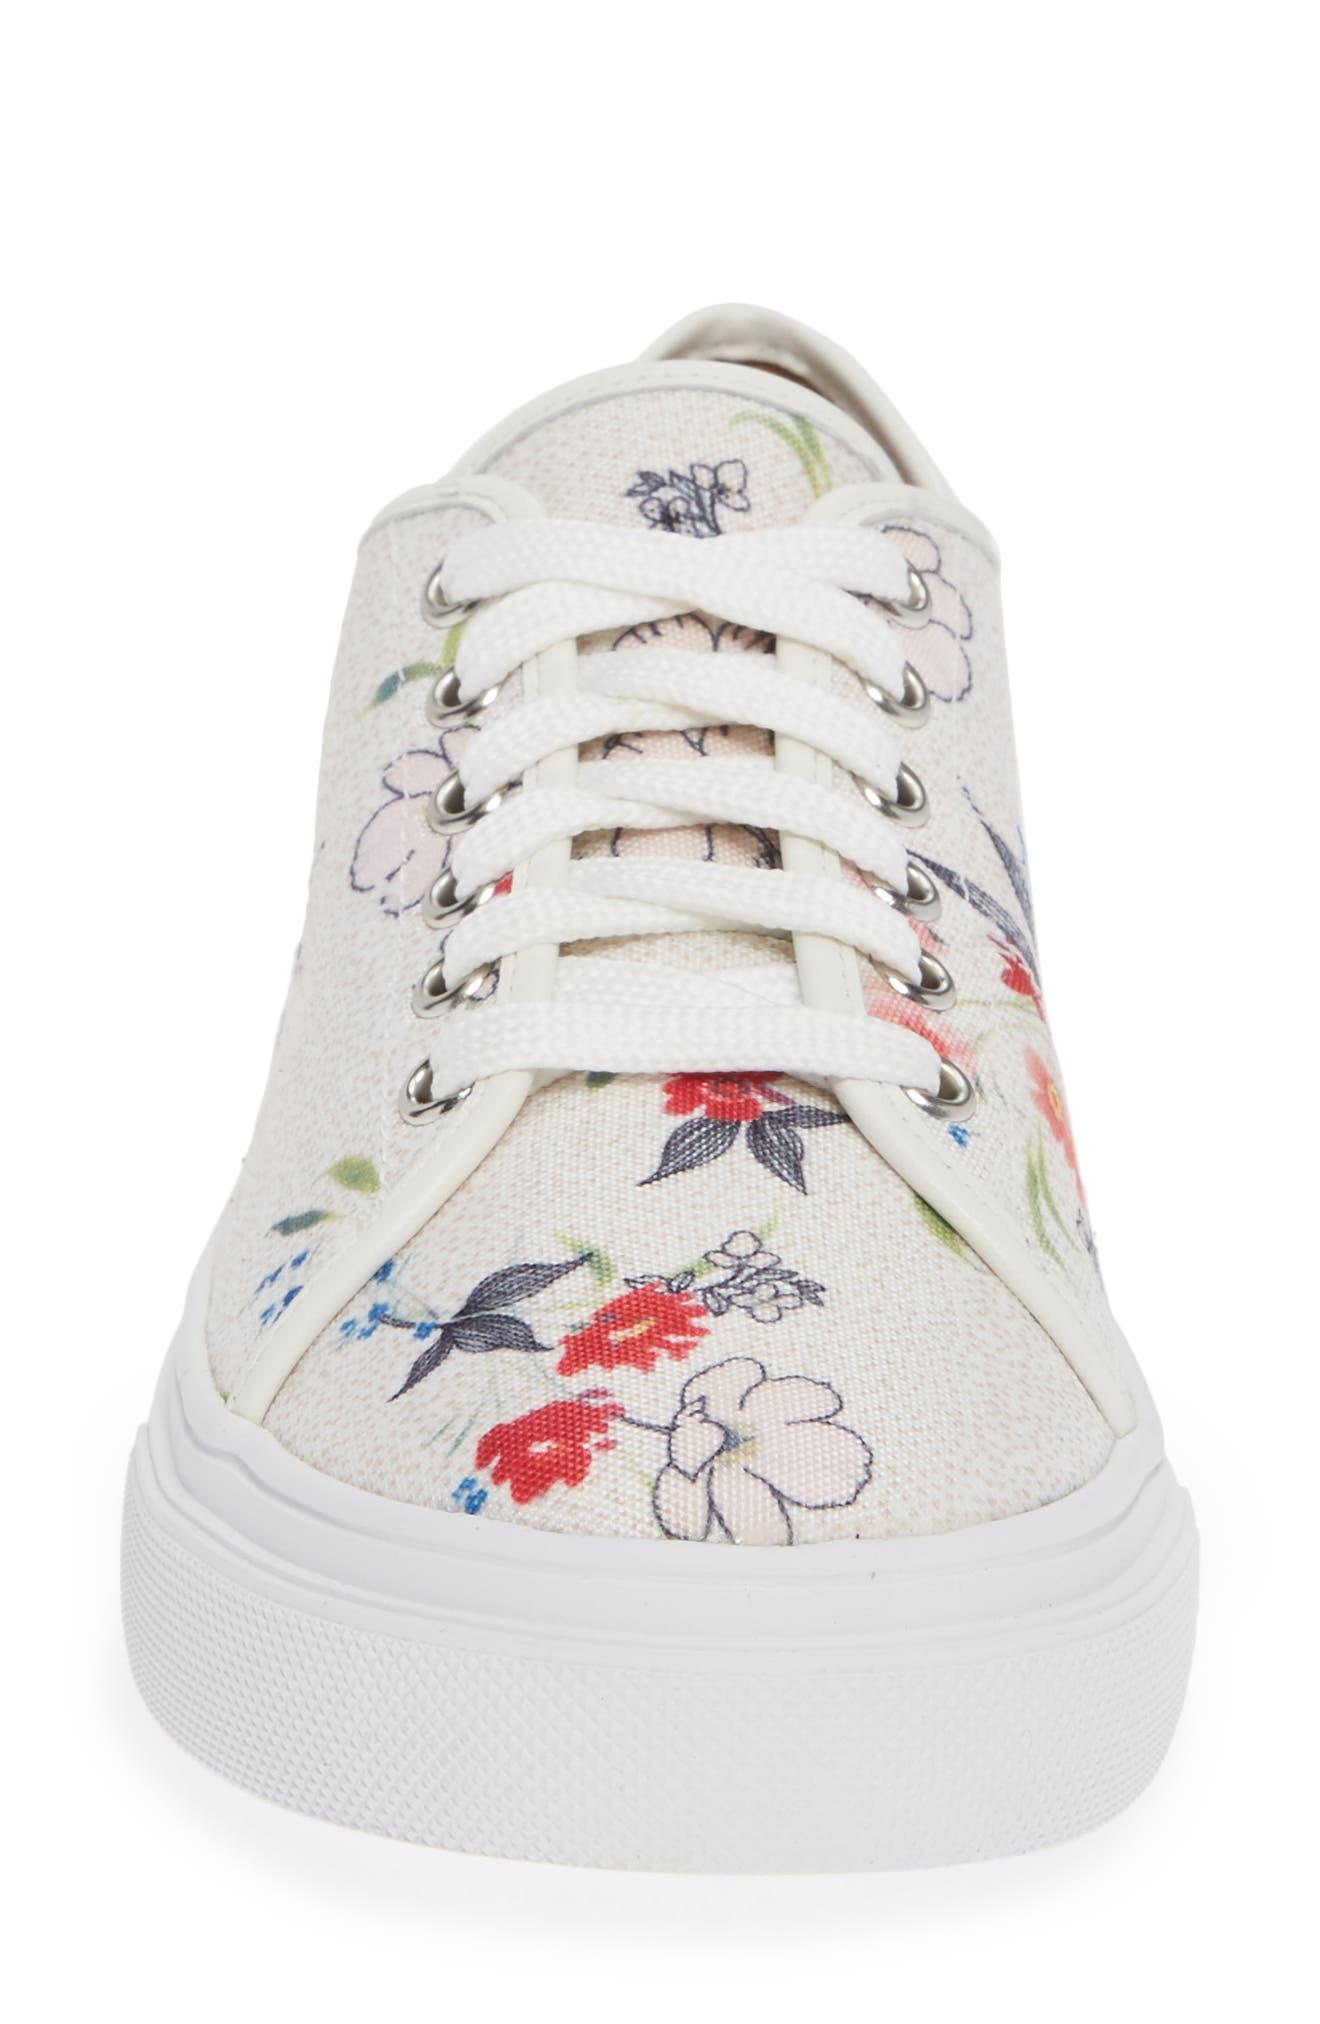 Ethan Low-Top Sneaker,                             Alternate thumbnail 4, color,                             WHITE FLORAL CANVAS